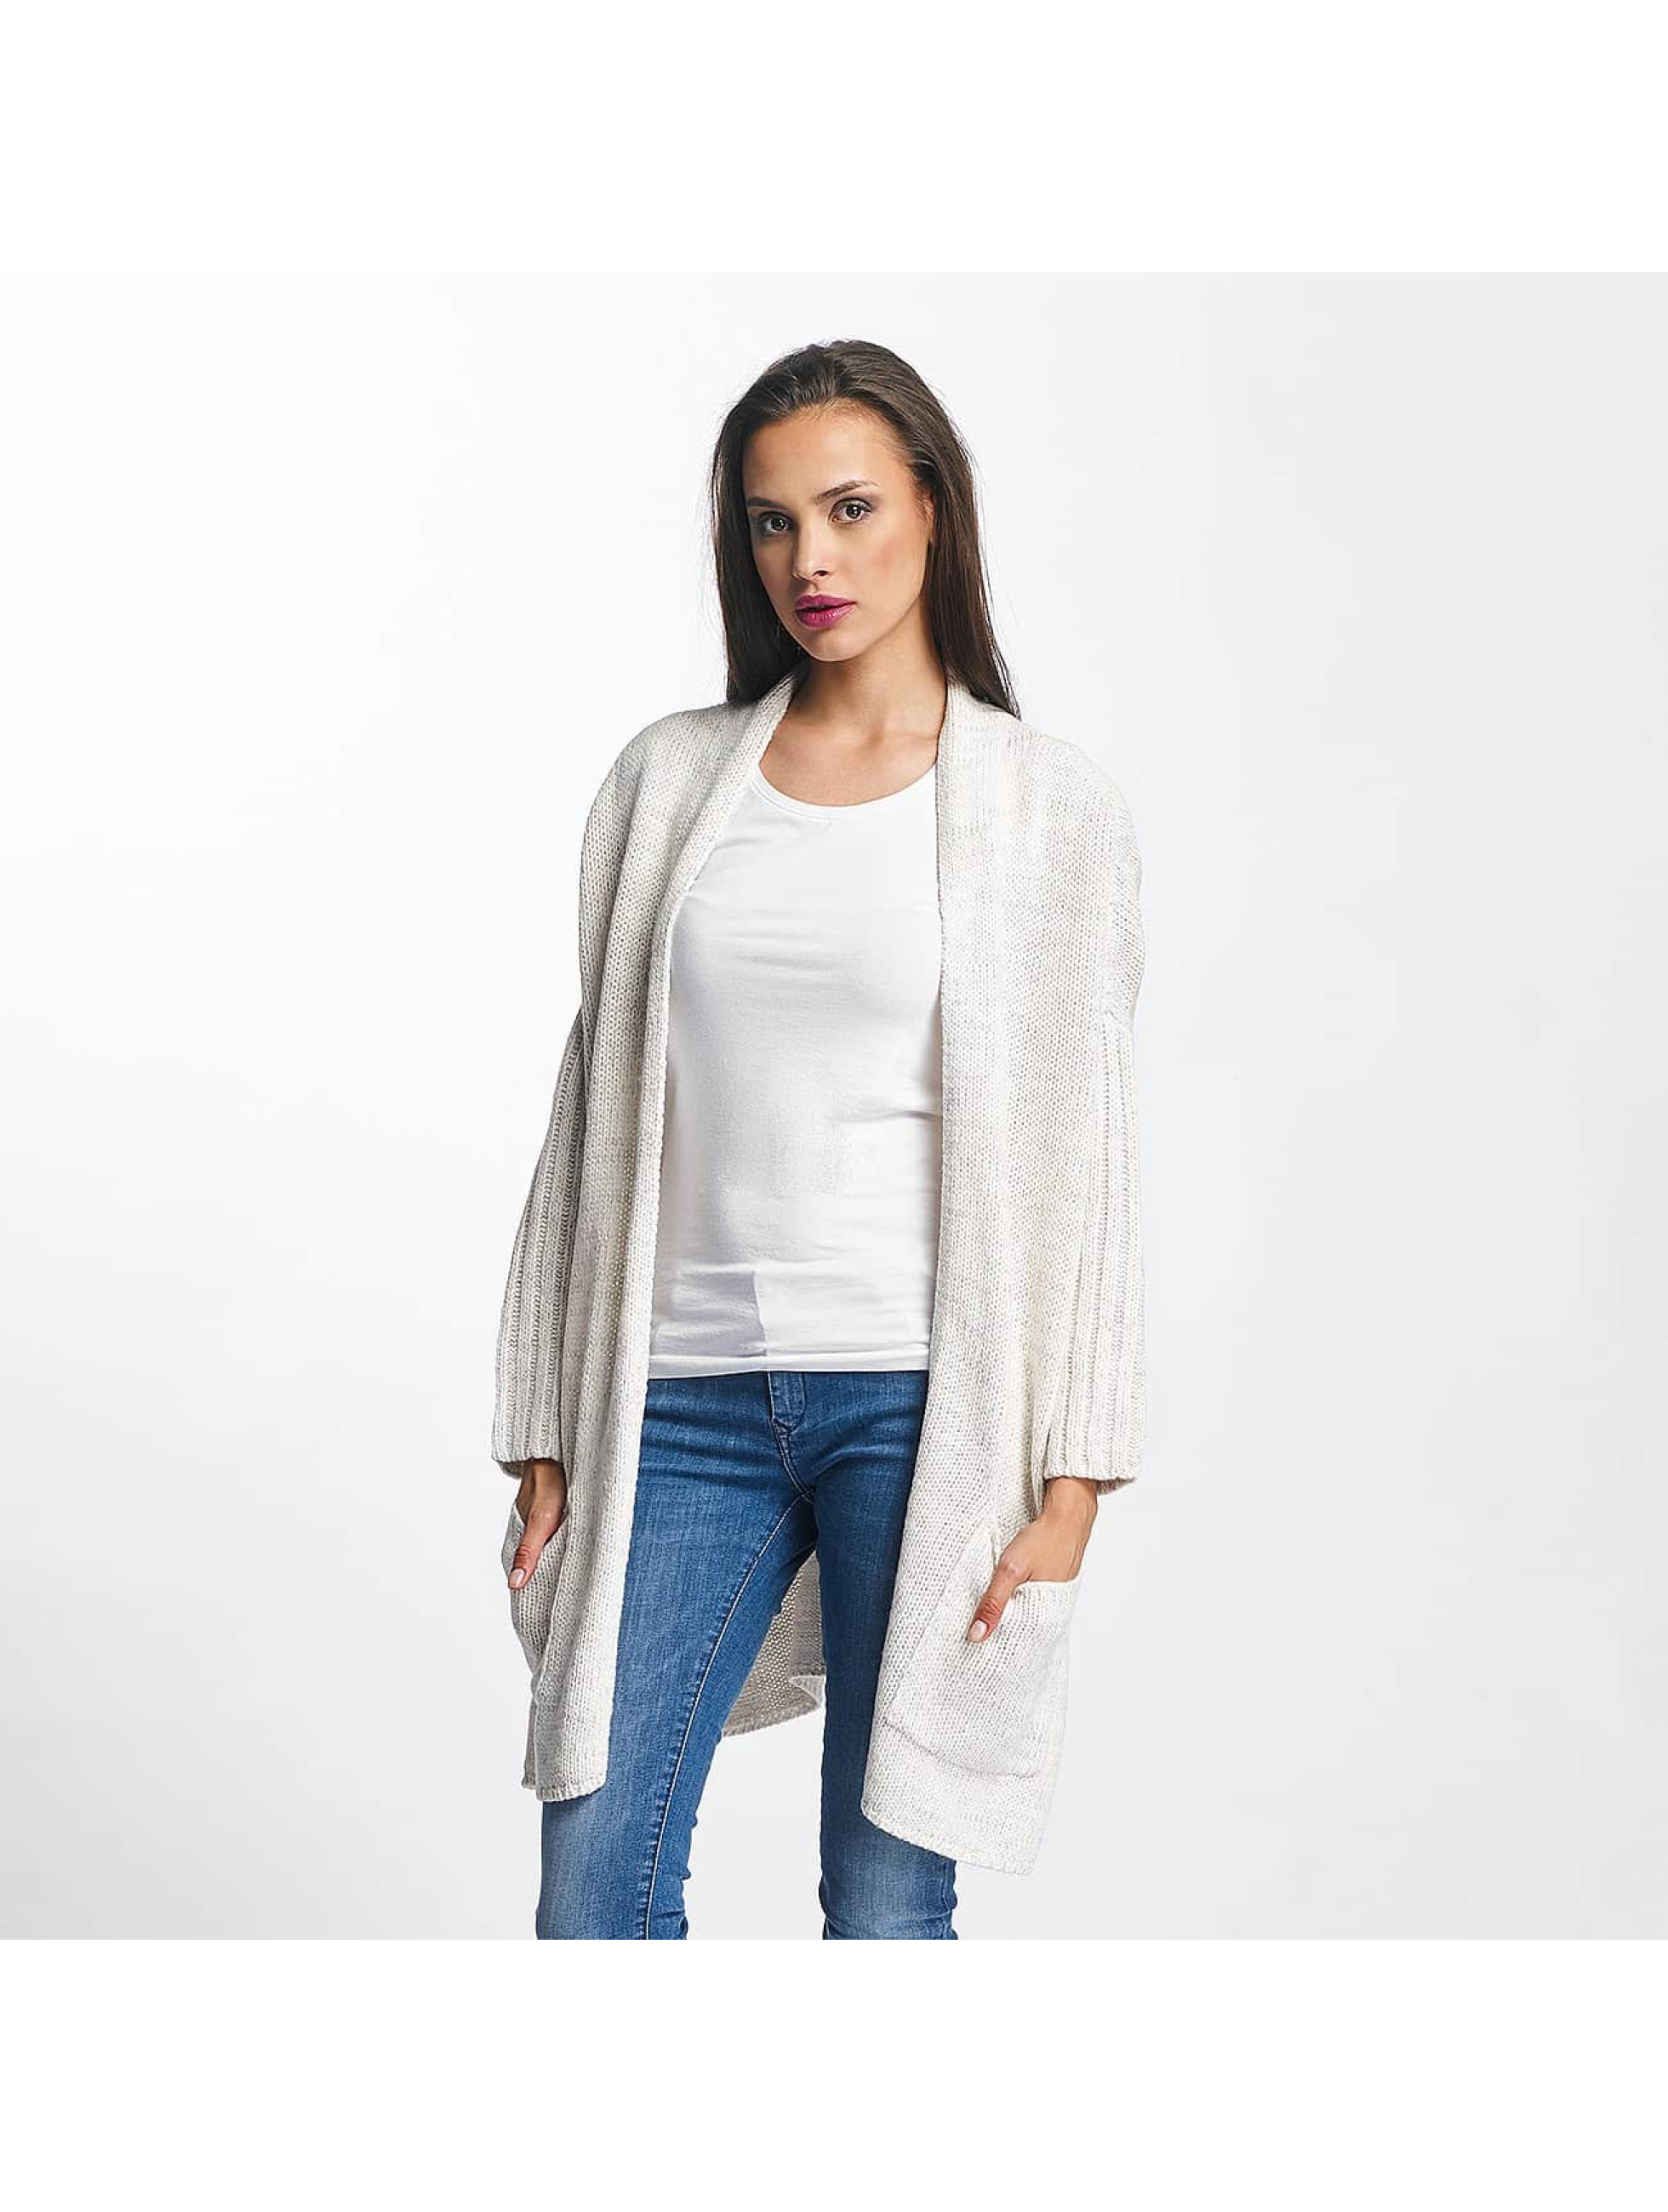 Urban Classics Frauen Strickjacke Oversized in weiß